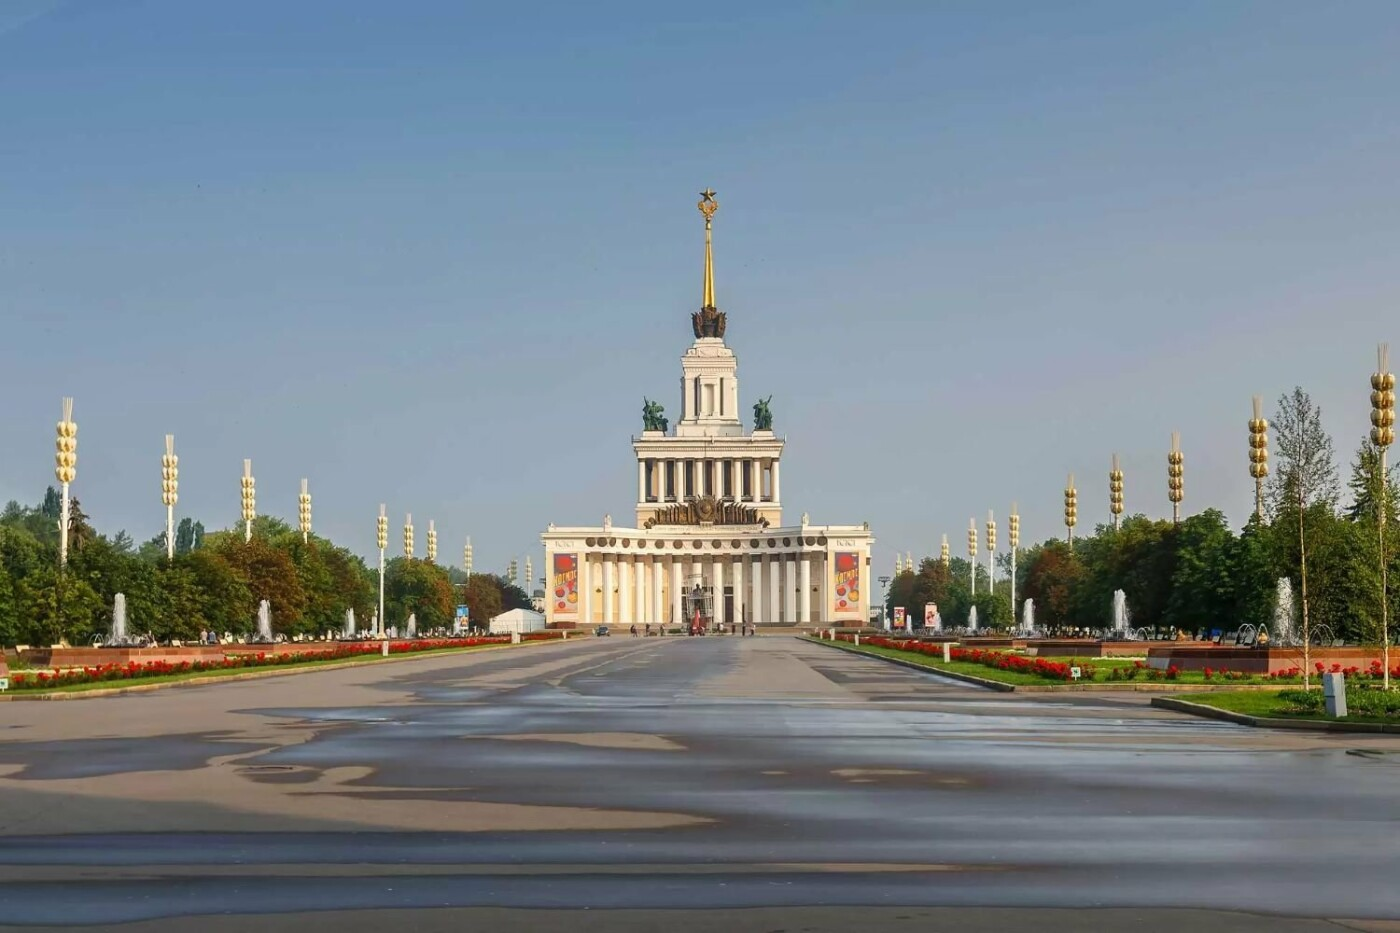 На праздновании 81 годовщины ВДНХ ждут москвичей, фото-1